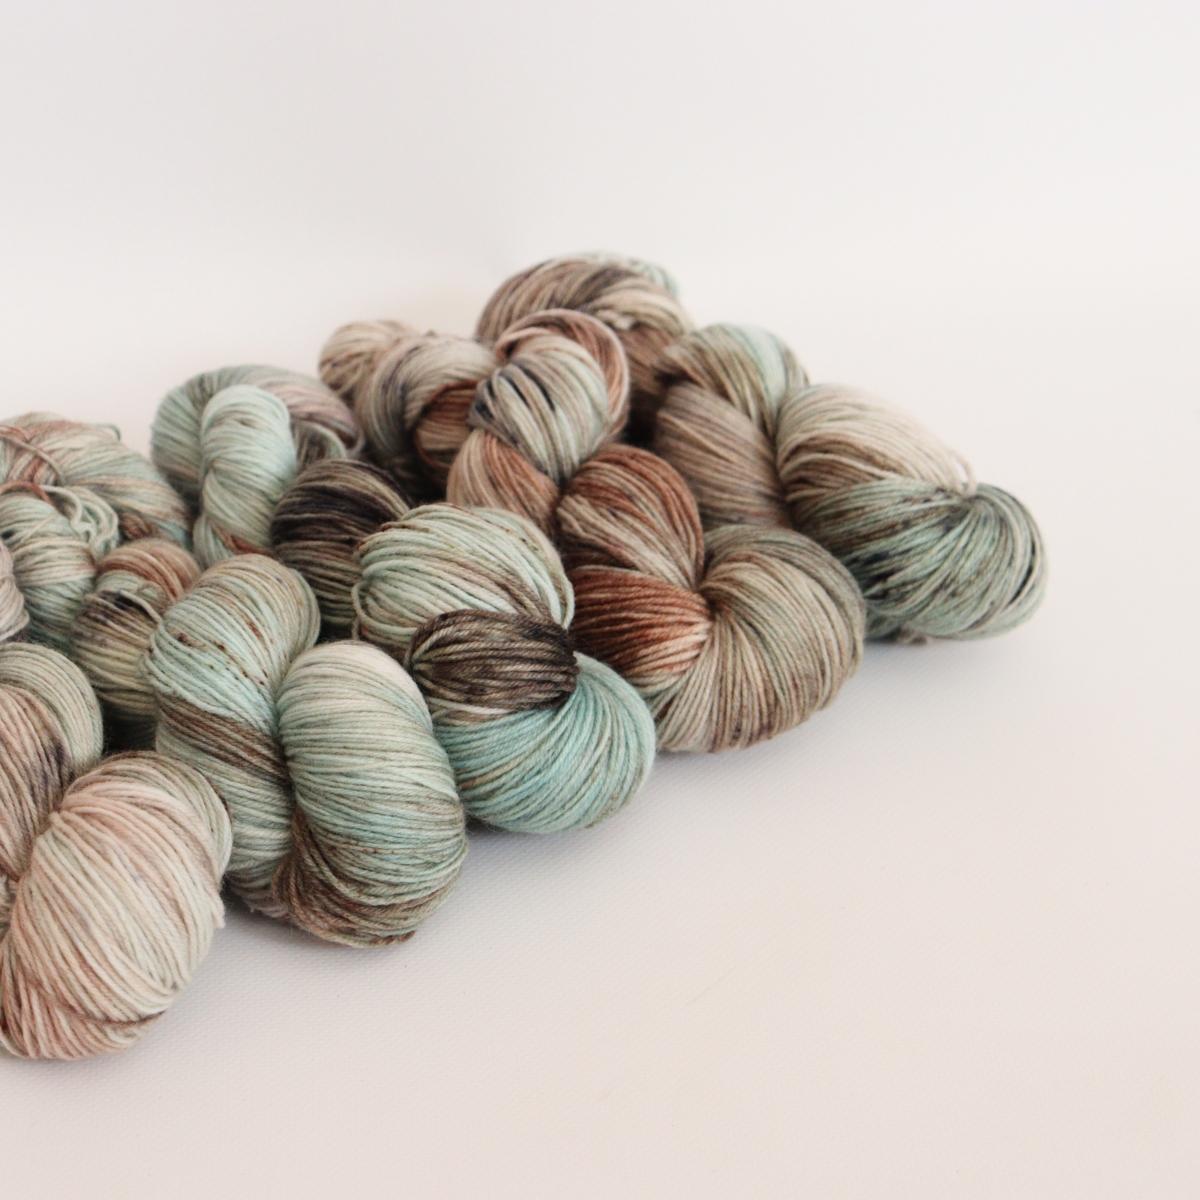 woodico.pro hand dyed yarn 055 1200x1200 - Hand dyed yarn / 055